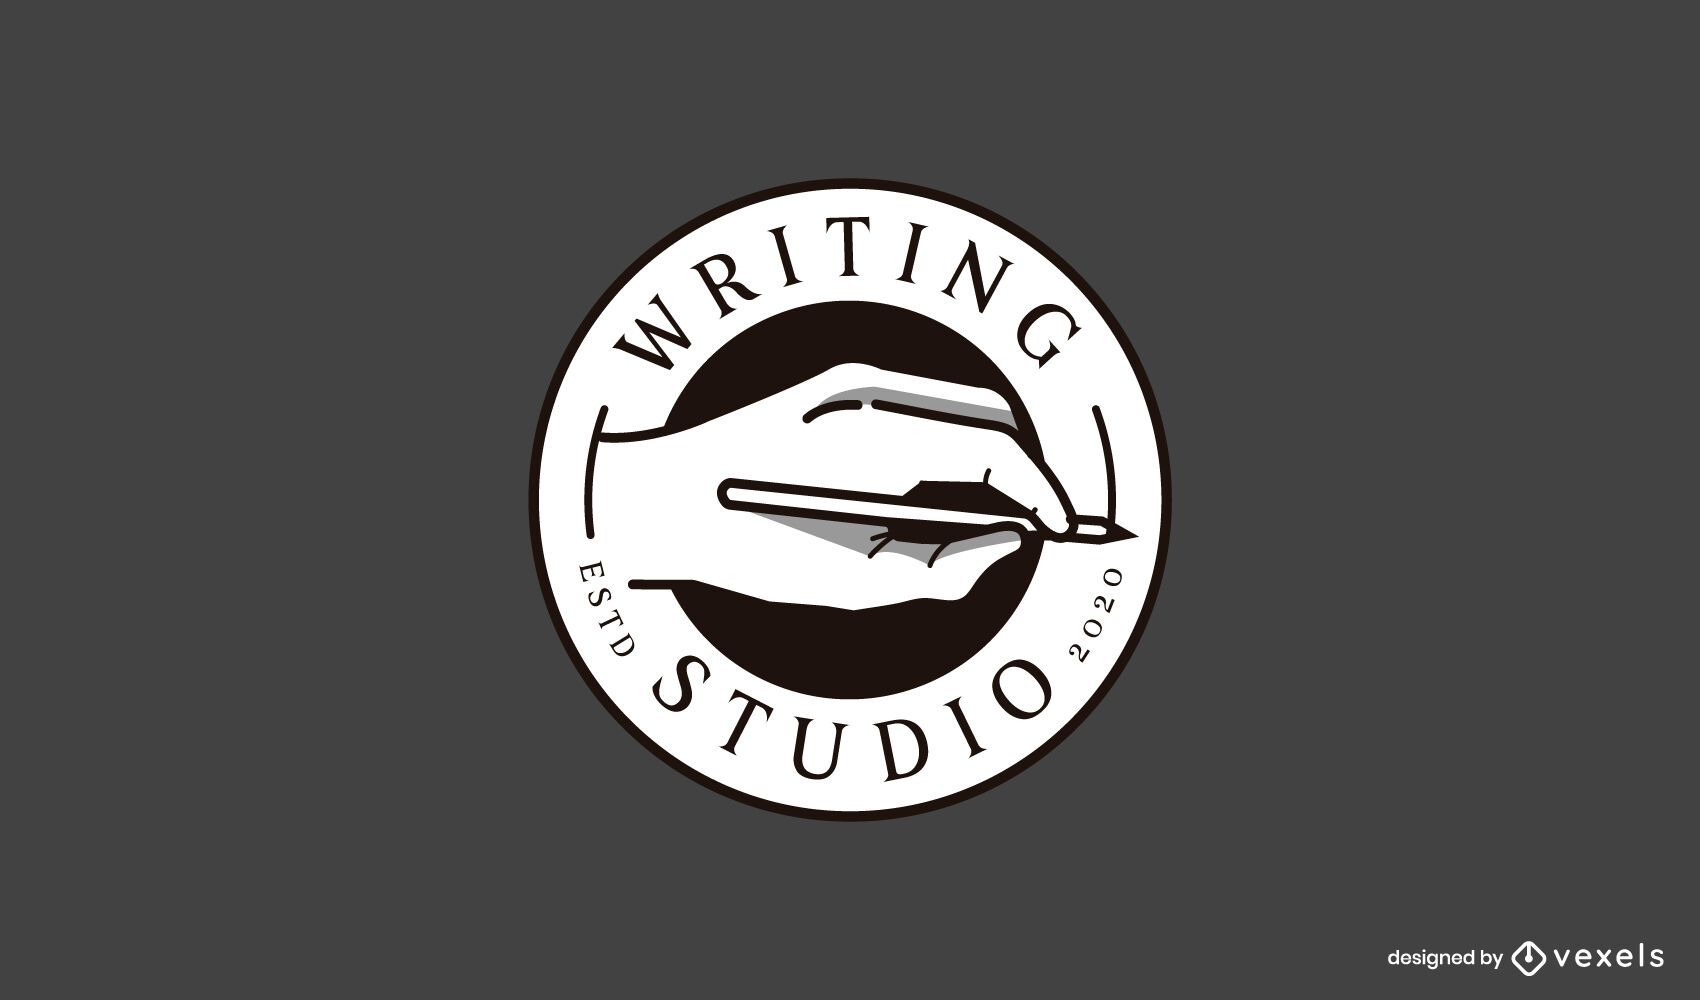 Writing studio business logo